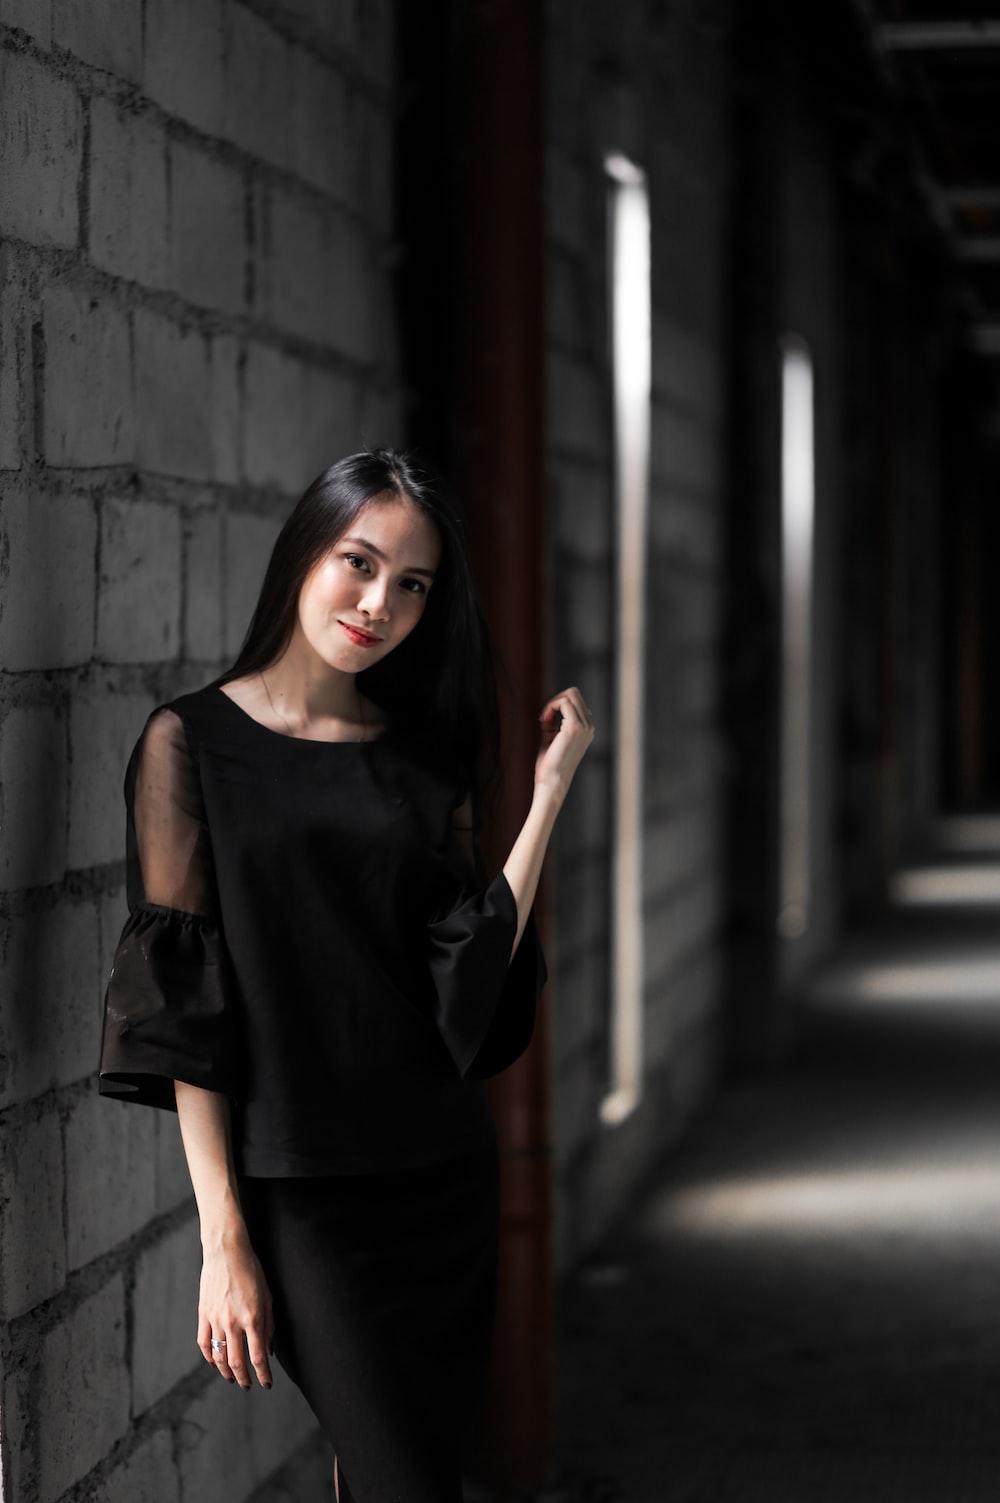 woman in black tank top standing beside wall